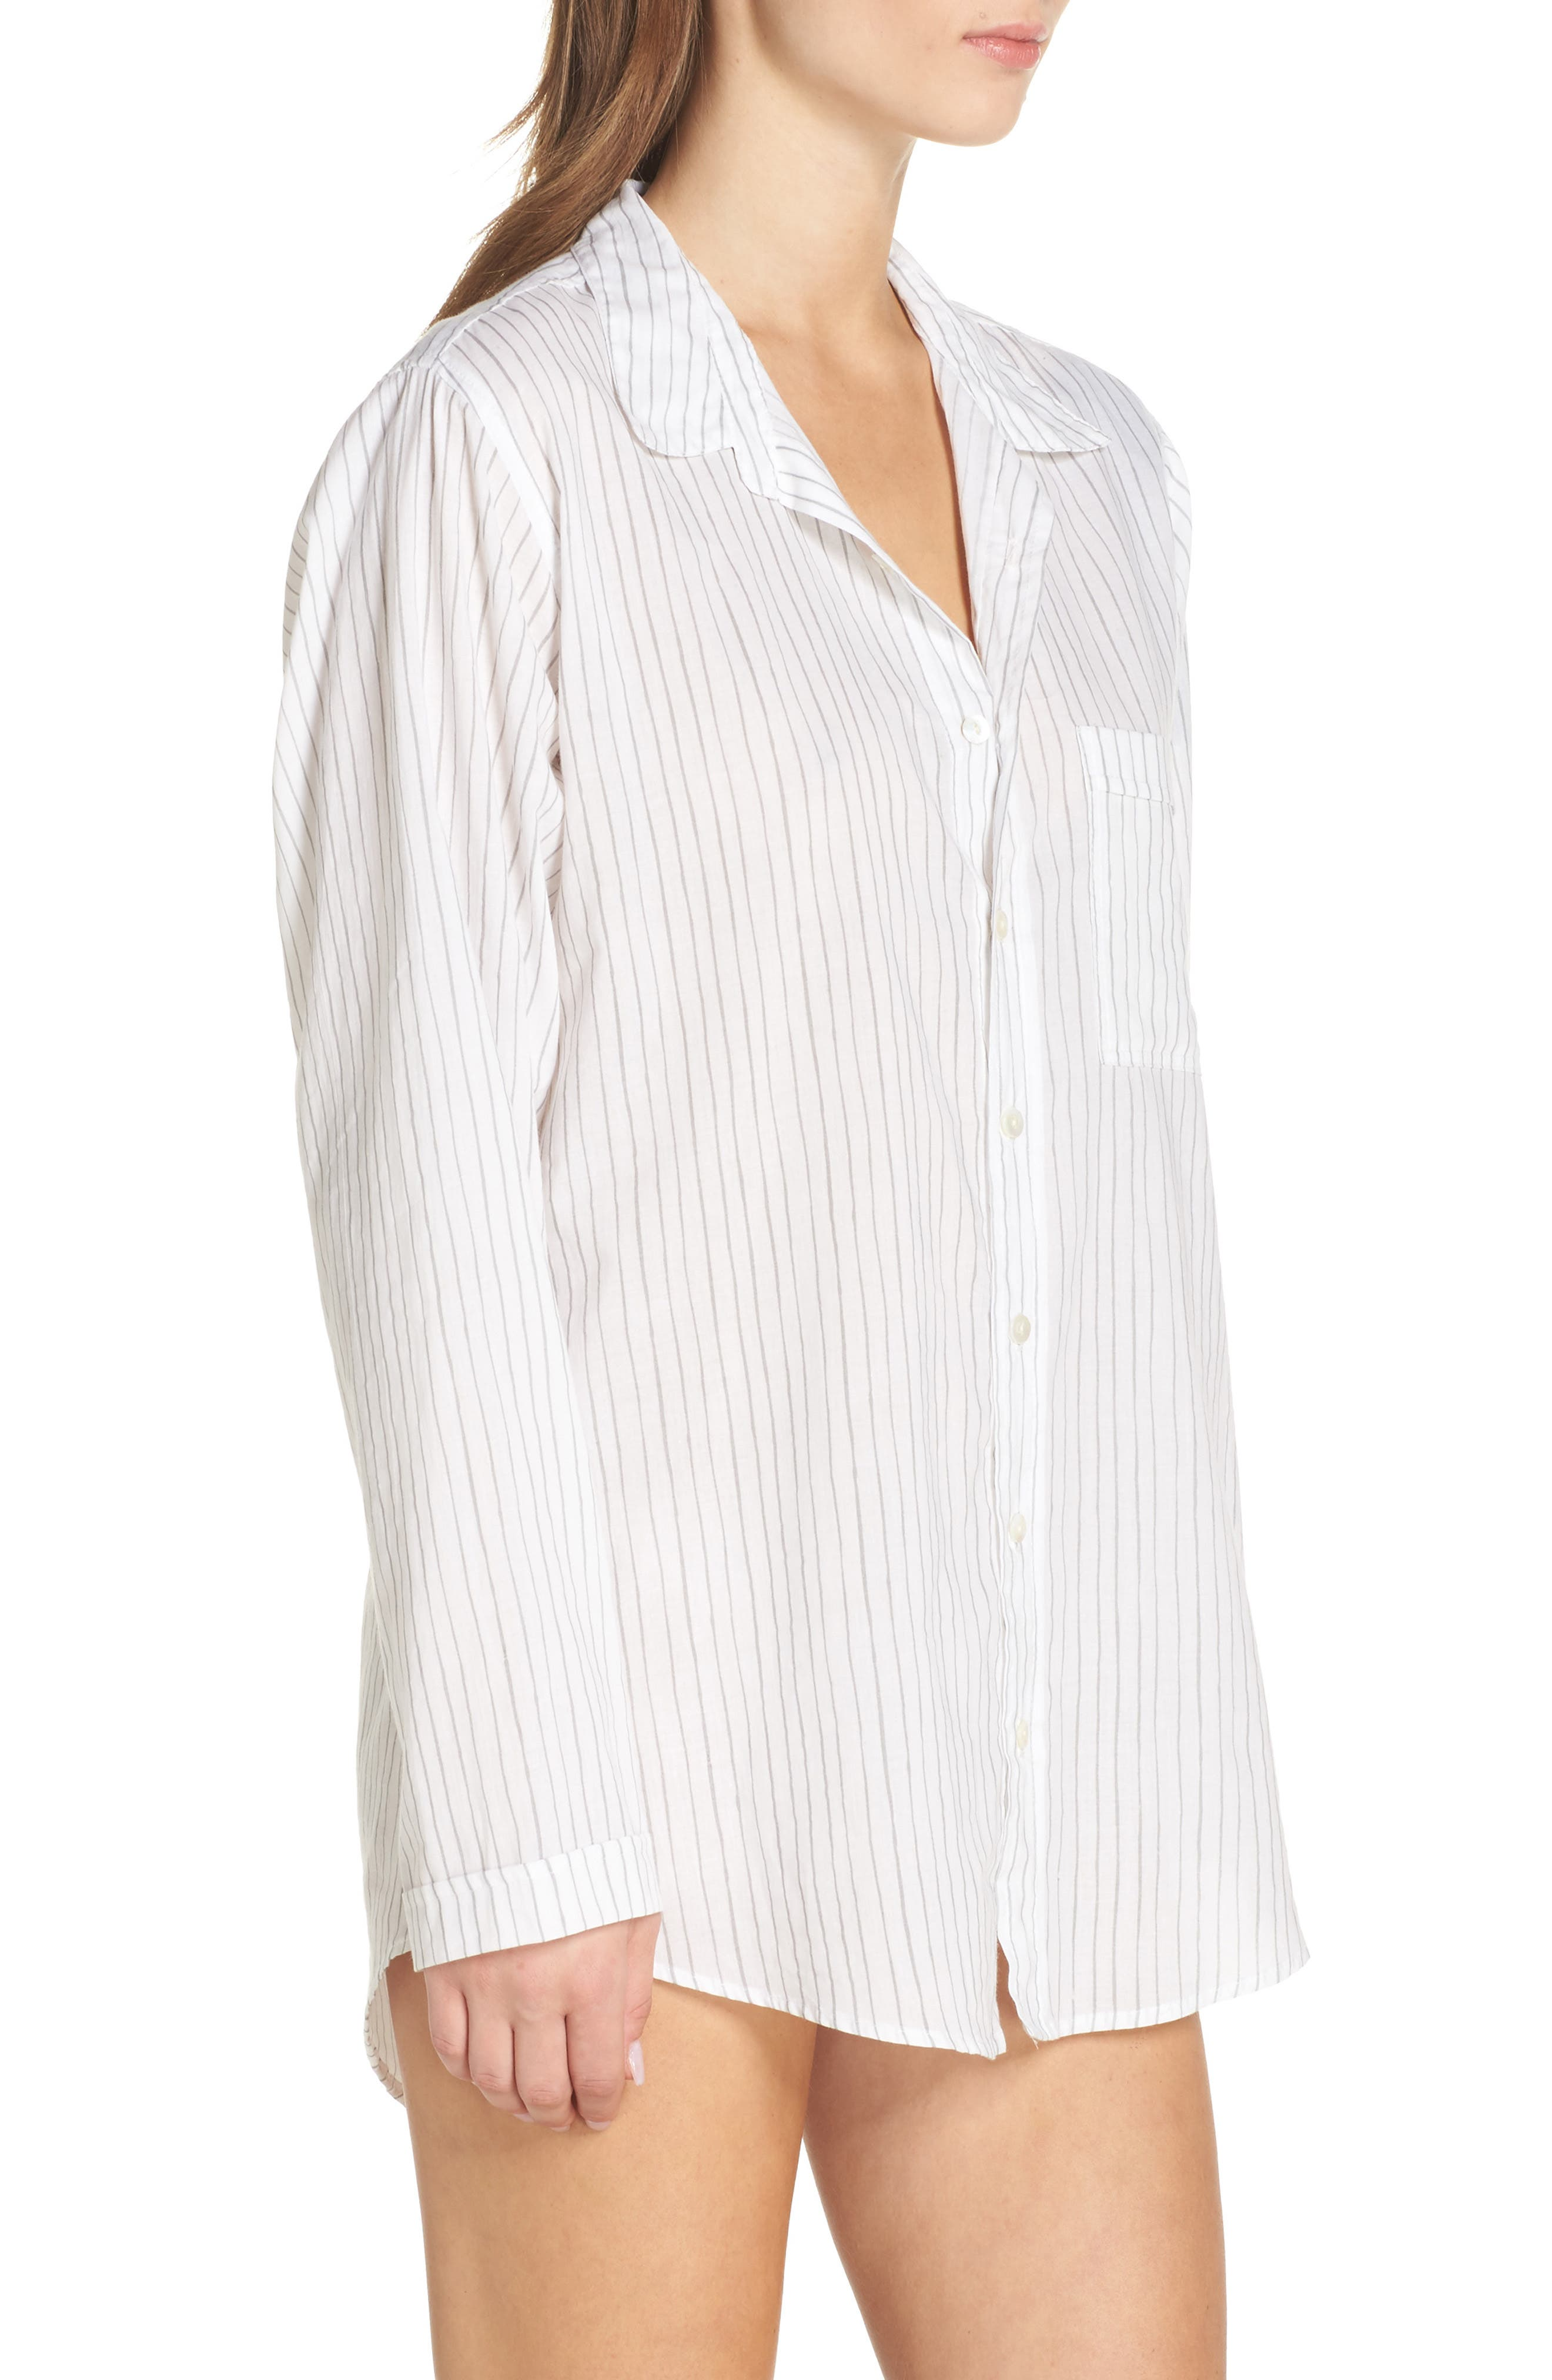 Alternate Image 2  - Pour Les Femmes Pinstripe Boyfriend Sleep Shirt